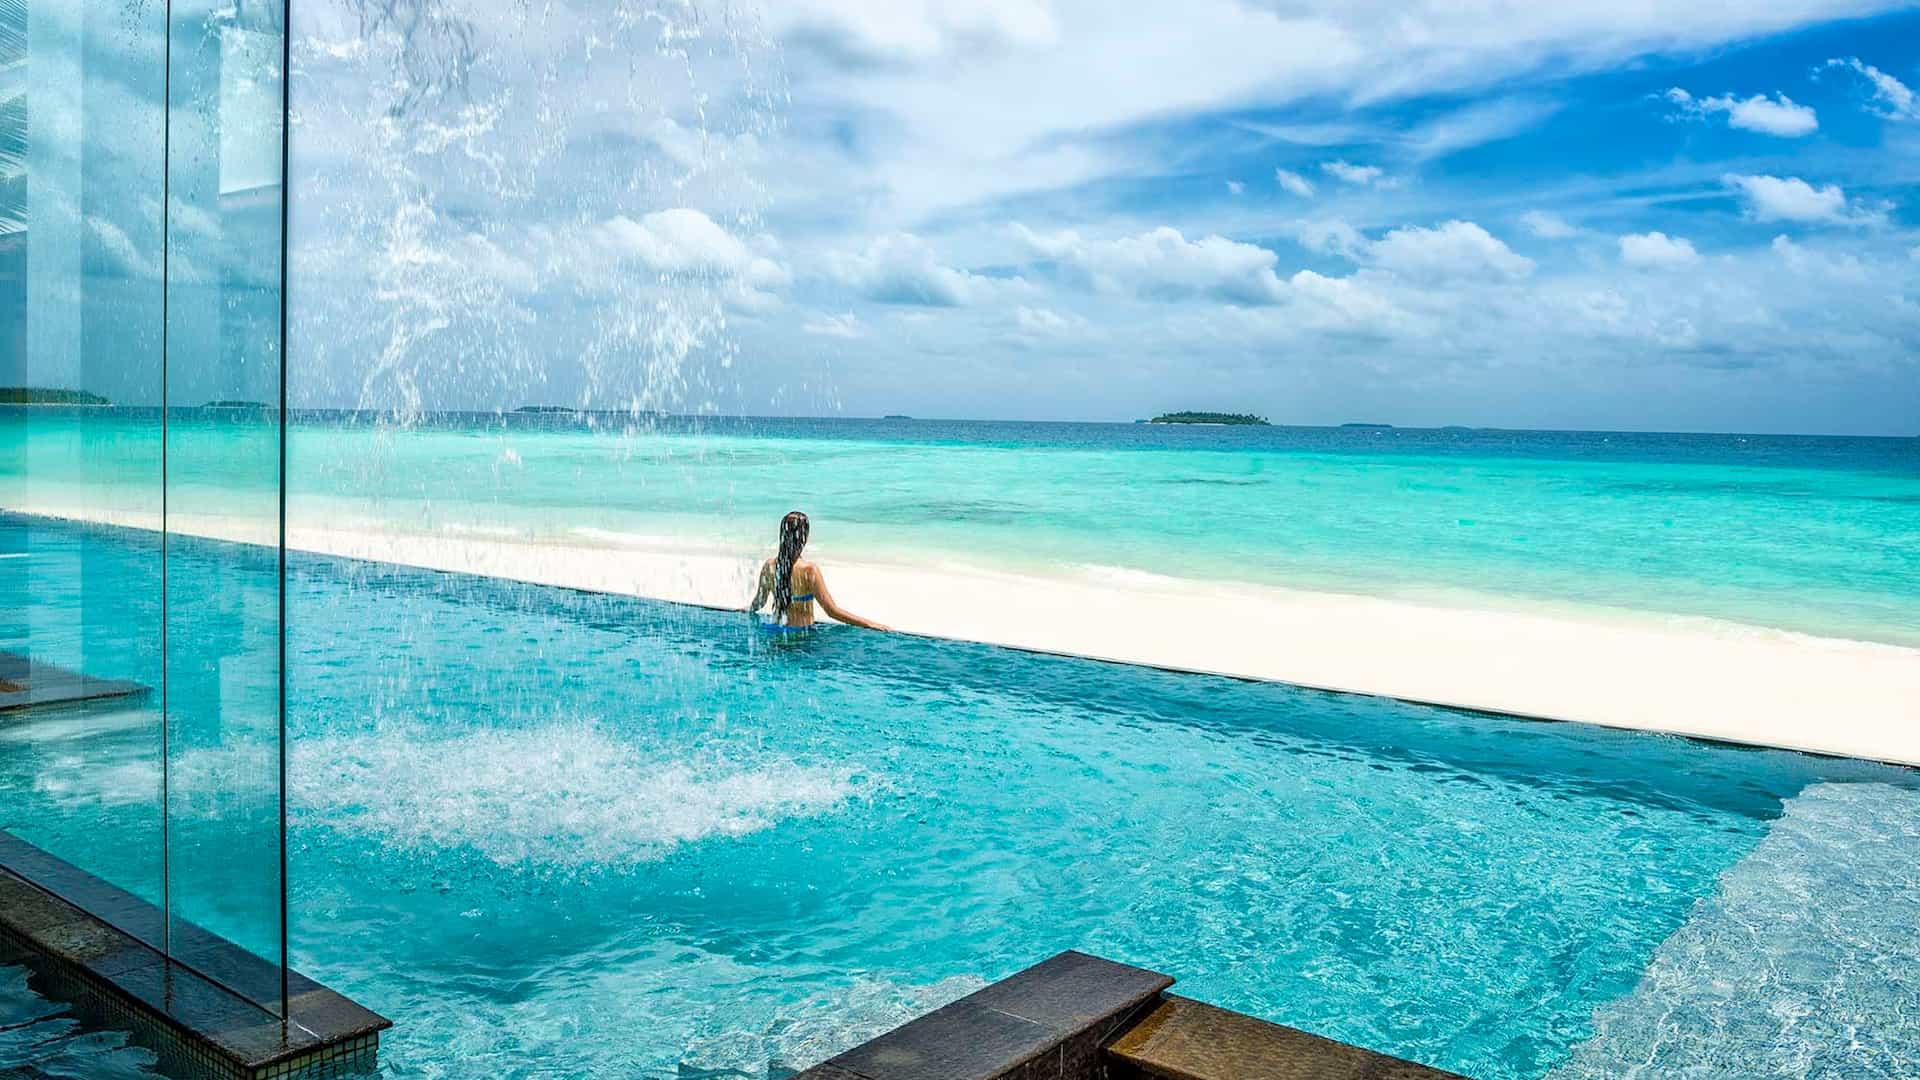 Four Seasons Landaa Giraavaru - Viaggio di nozze alle Maldive